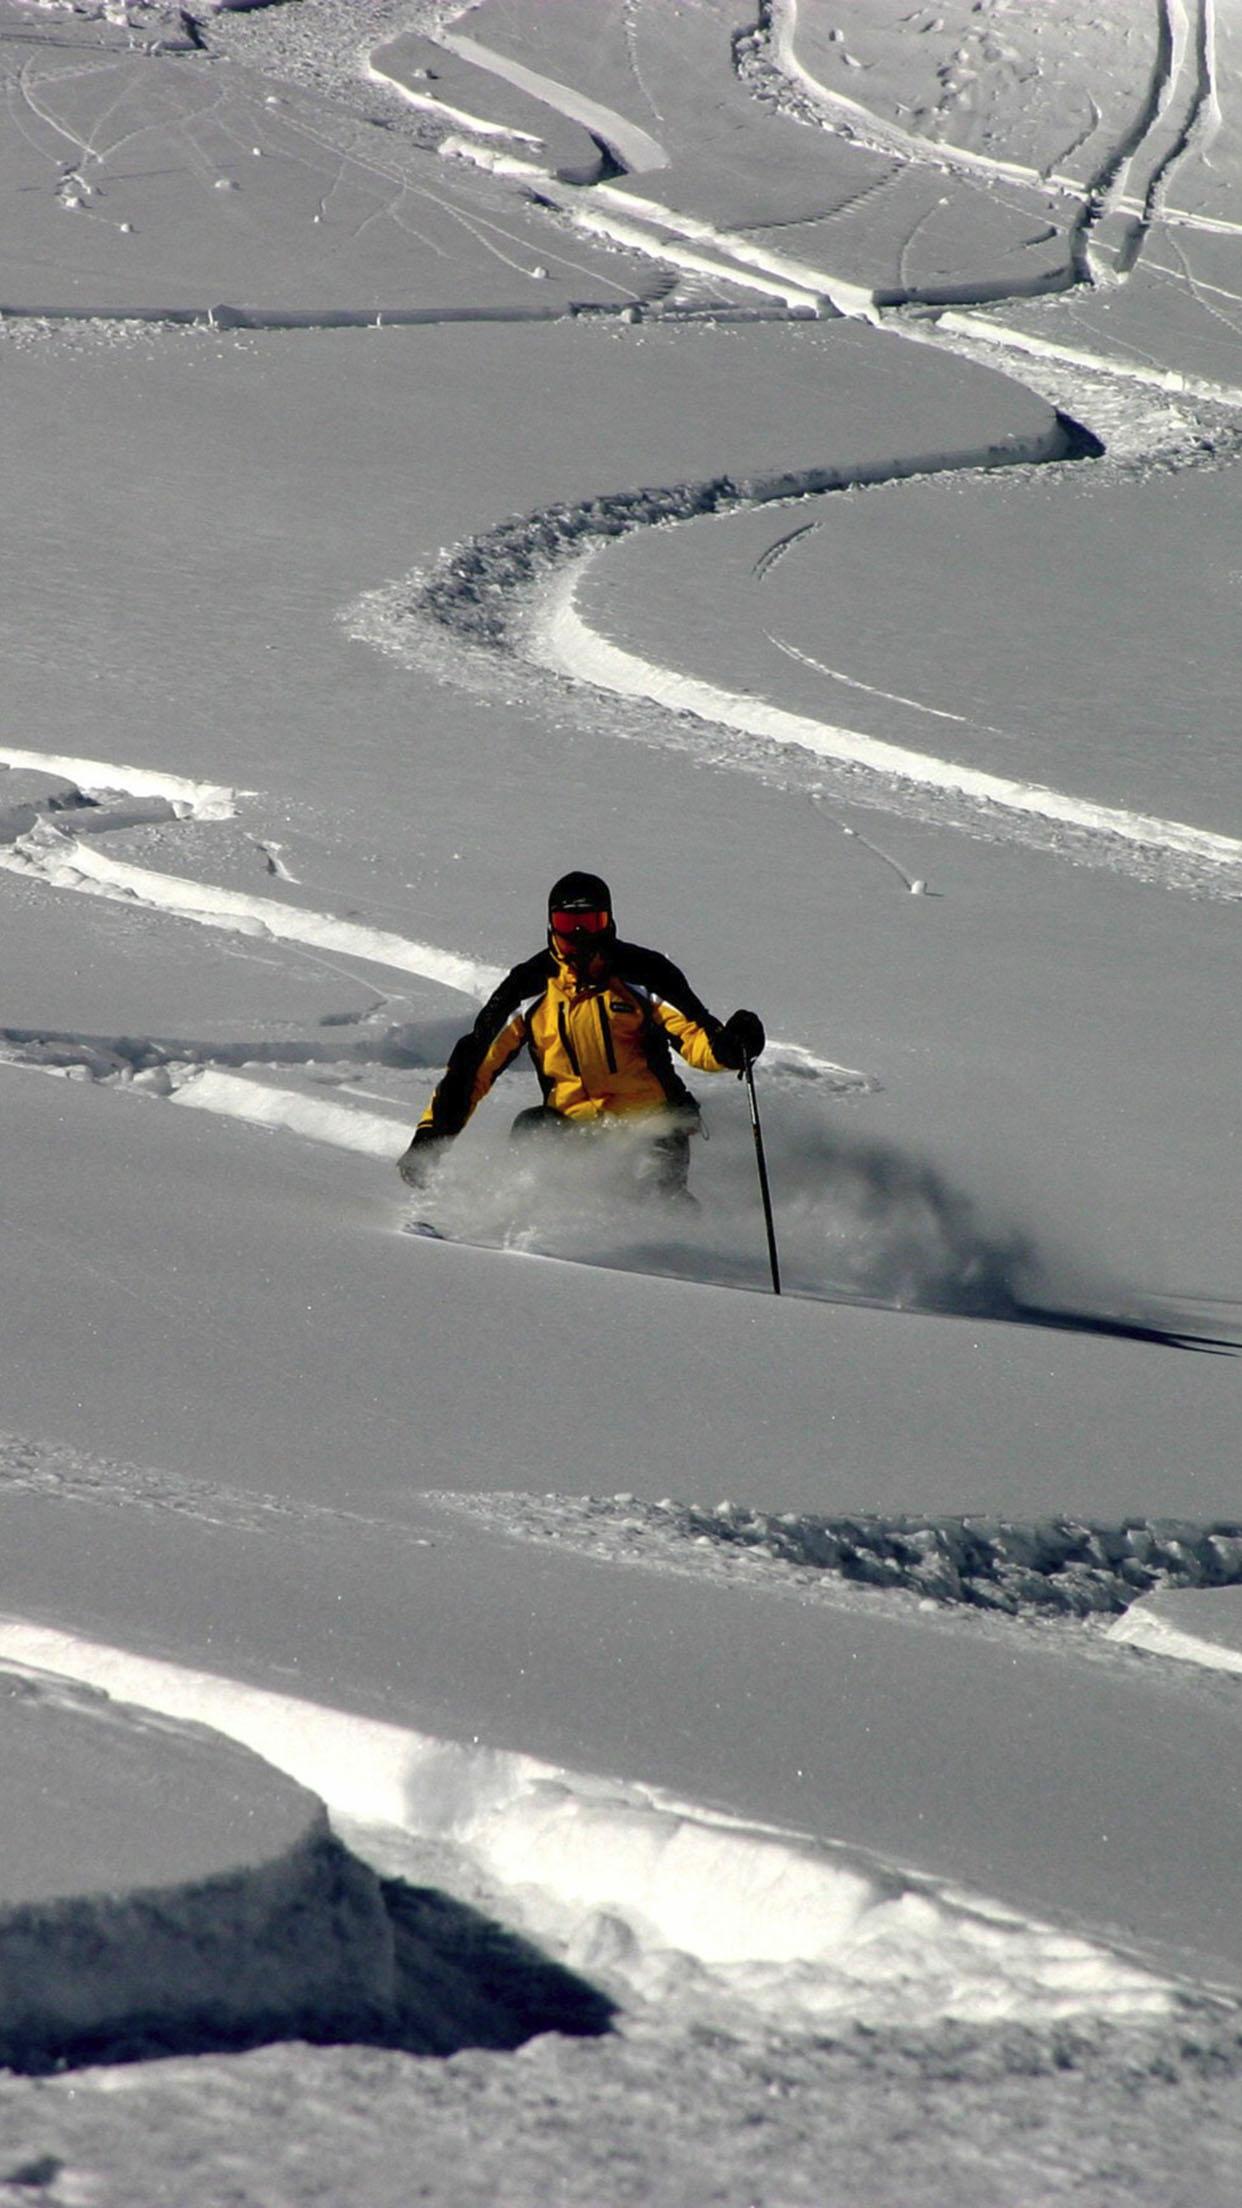 Ski Ski 3 3Wallpapers iPhone Parallax Ski 3